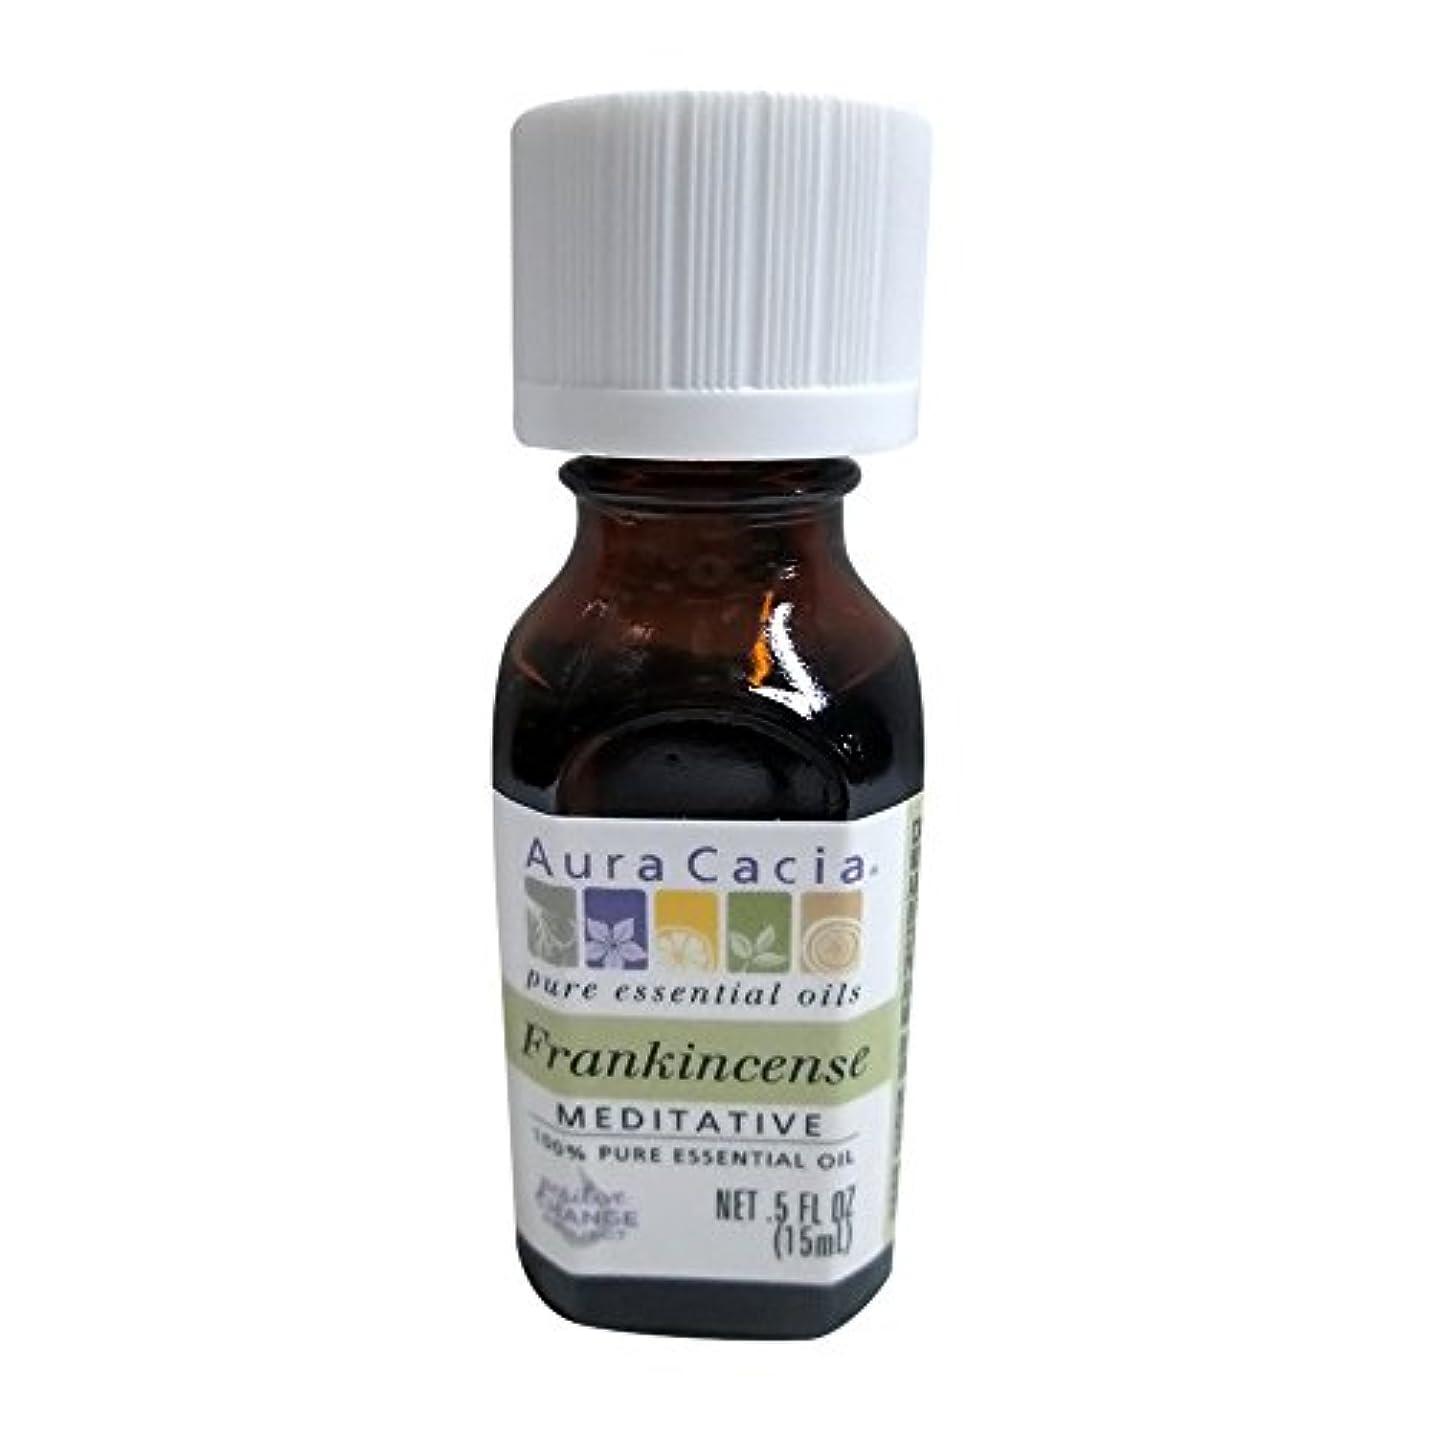 証言相手先駆者Aura Cacia Frankincense Essential Oil 15 ml (並行輸入品)